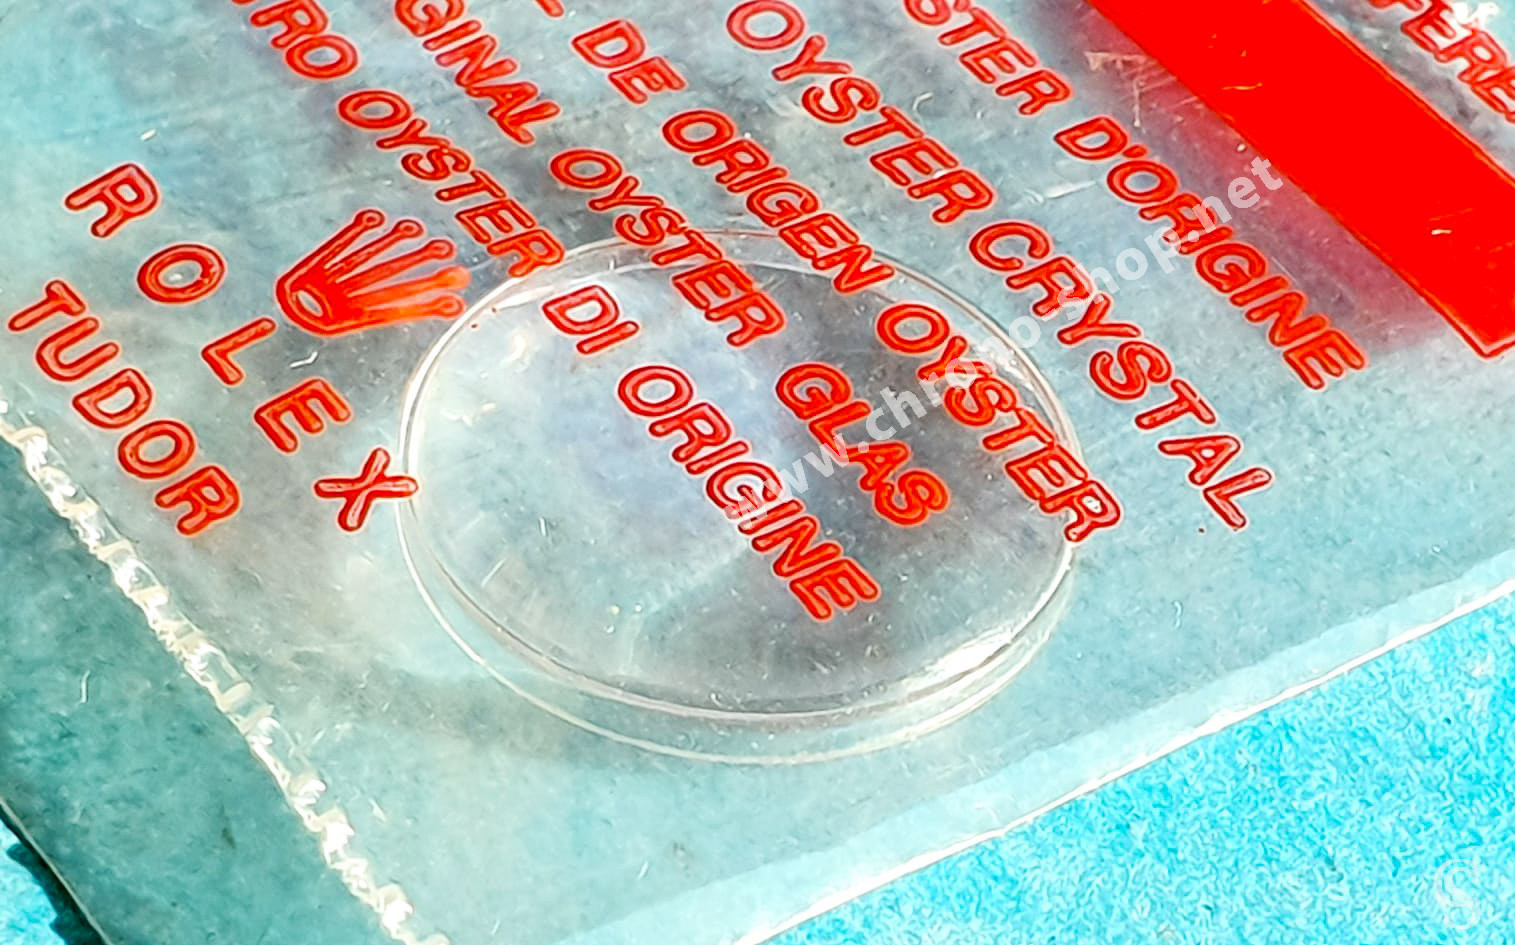 Rolex Tudor Rare Vintage Superdome Tropic 2 verre plexiglas authentique & NOS montres dames